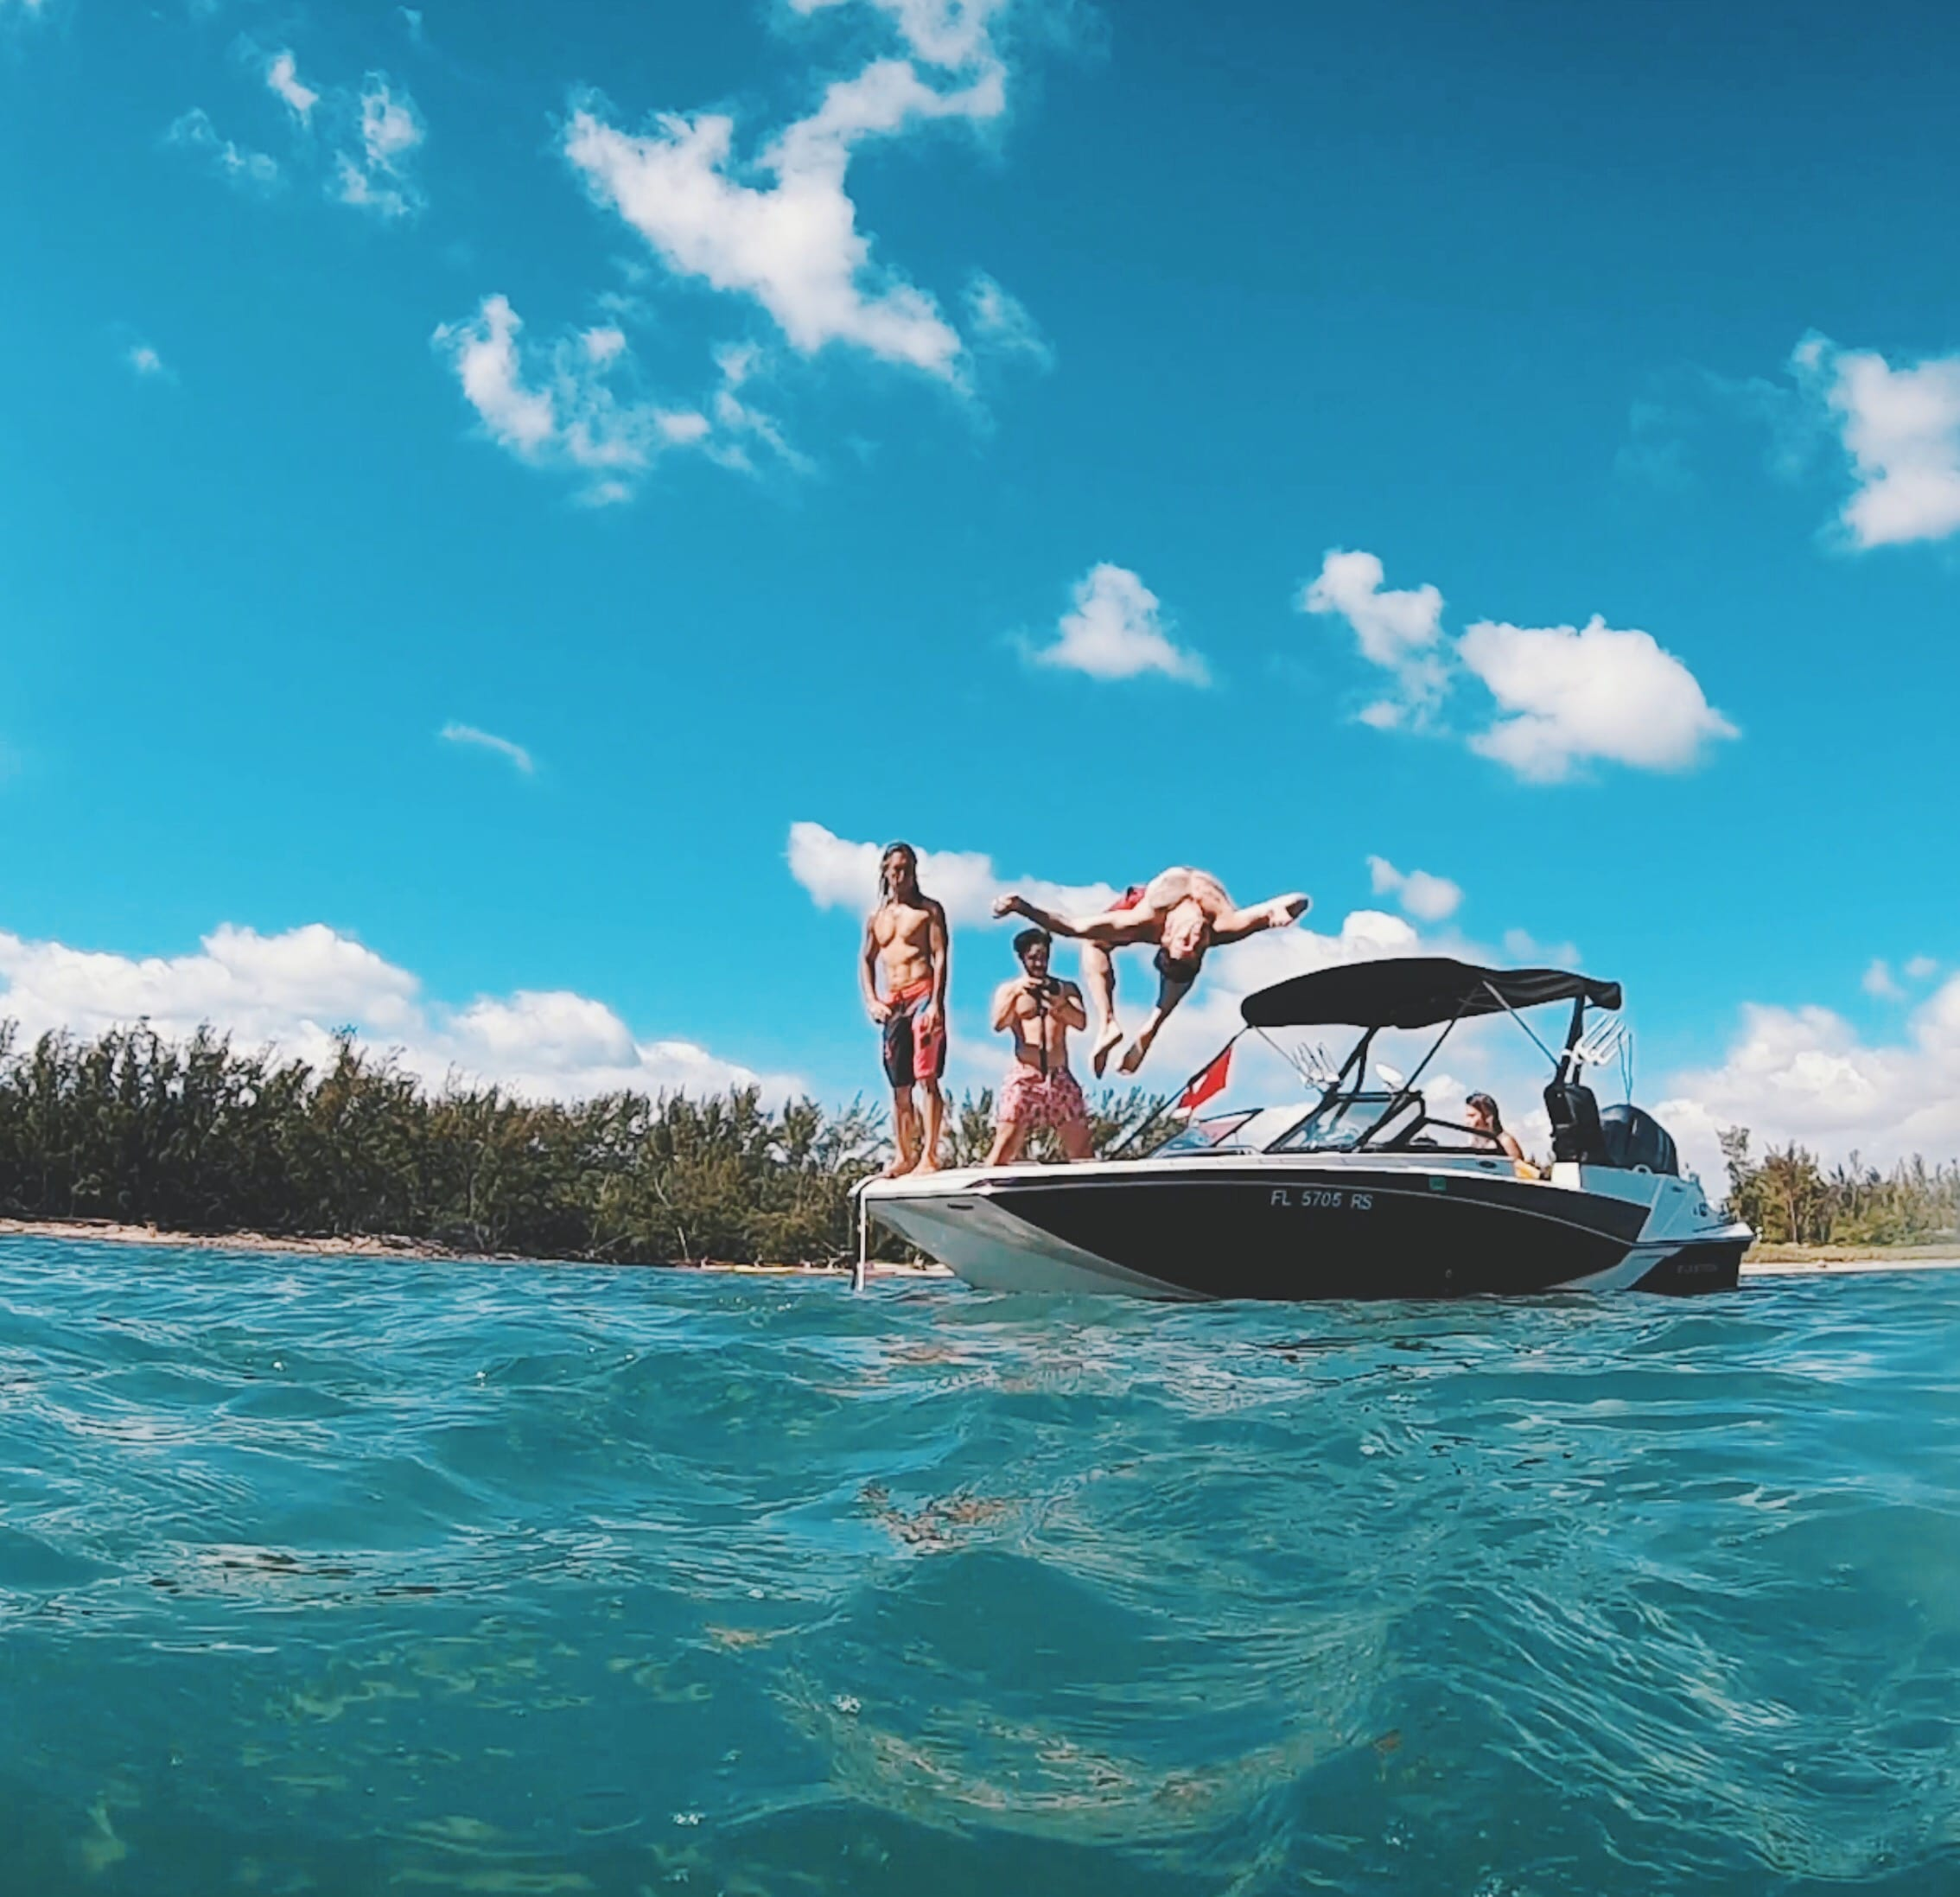 virginia key boat tour